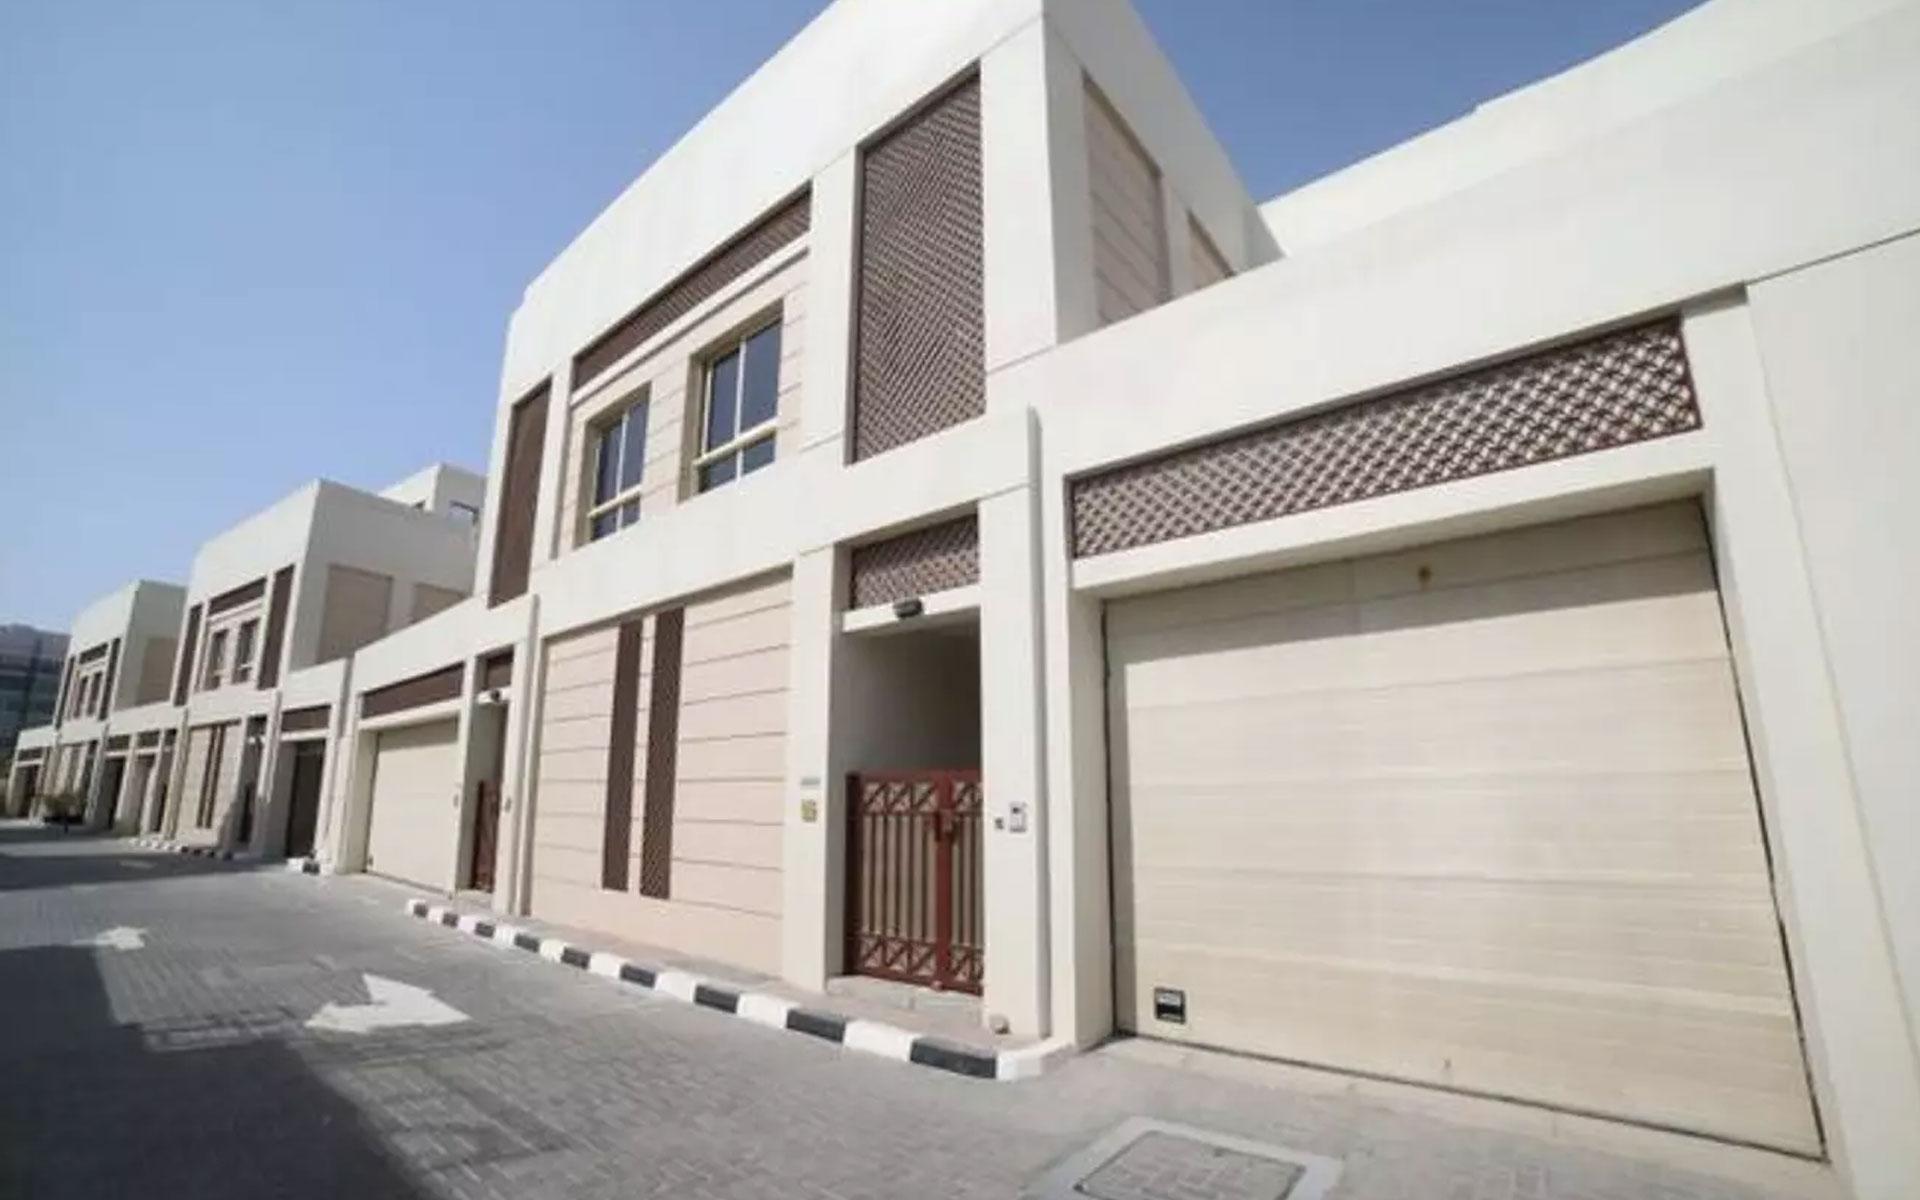 3-bedroom-villa-for-rent-in-bayti-33-at-al-barsha